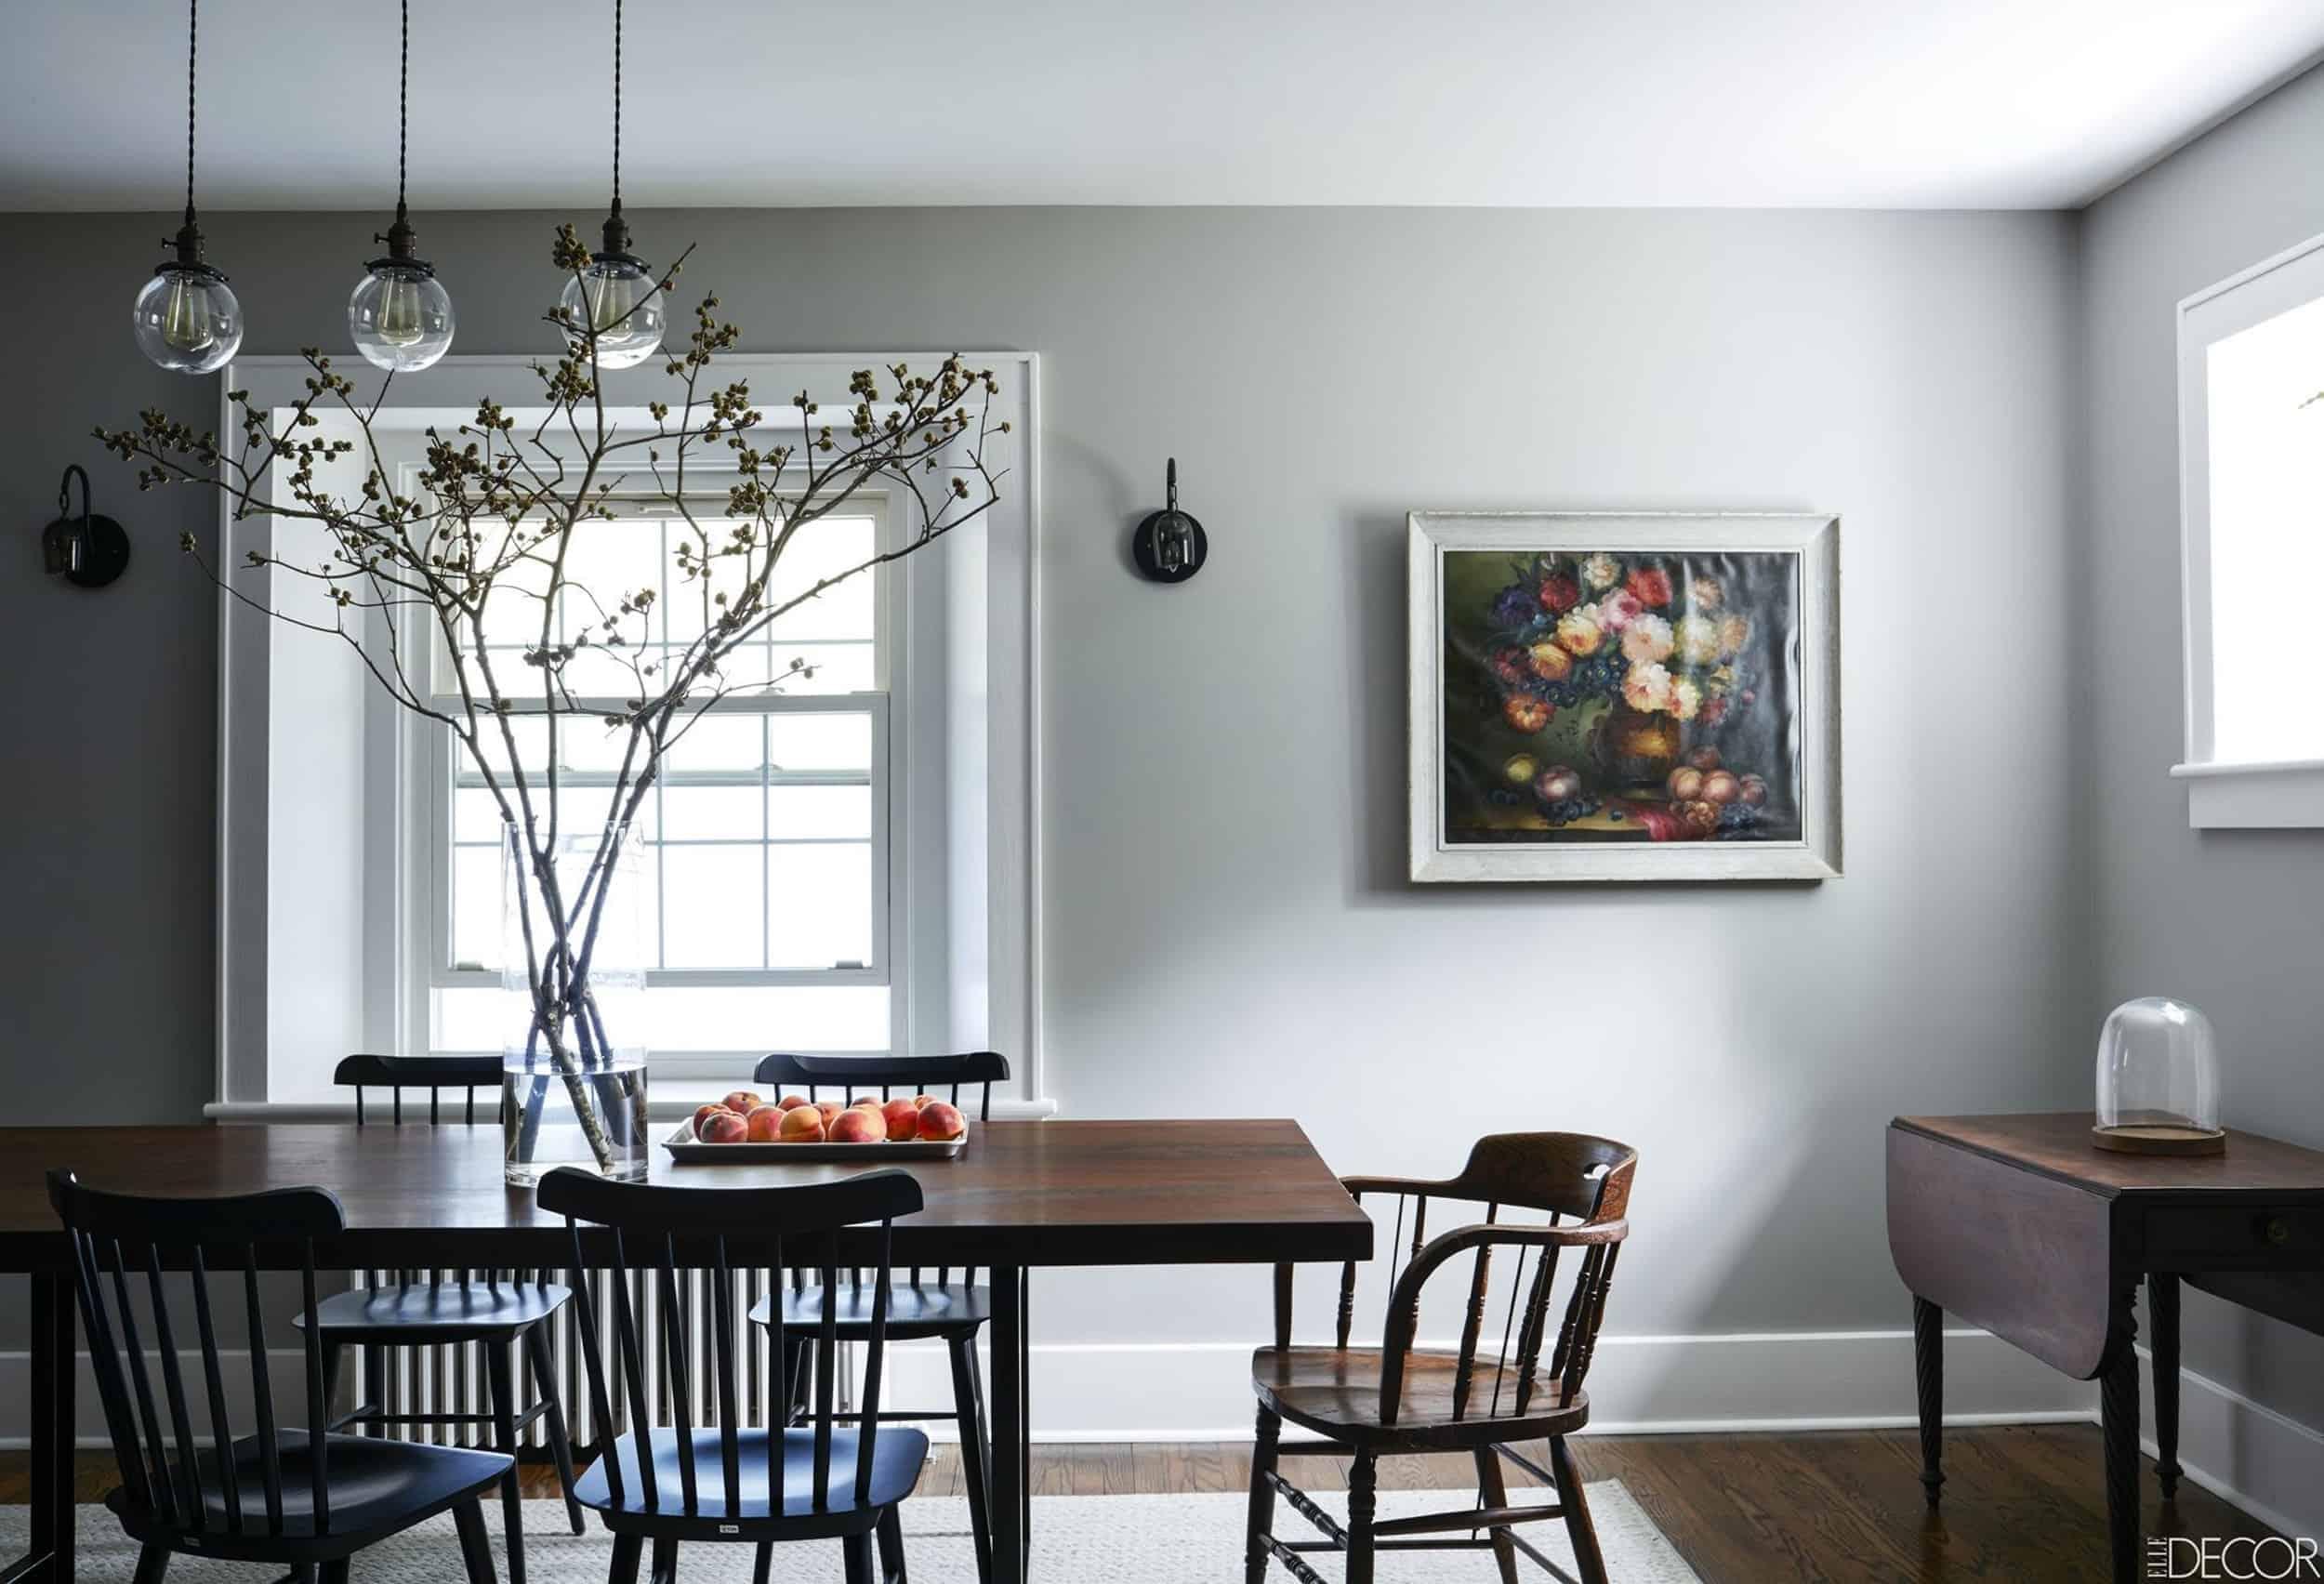 Dining Room Light Fixture Inspirational 20 Dining Room Light Fix